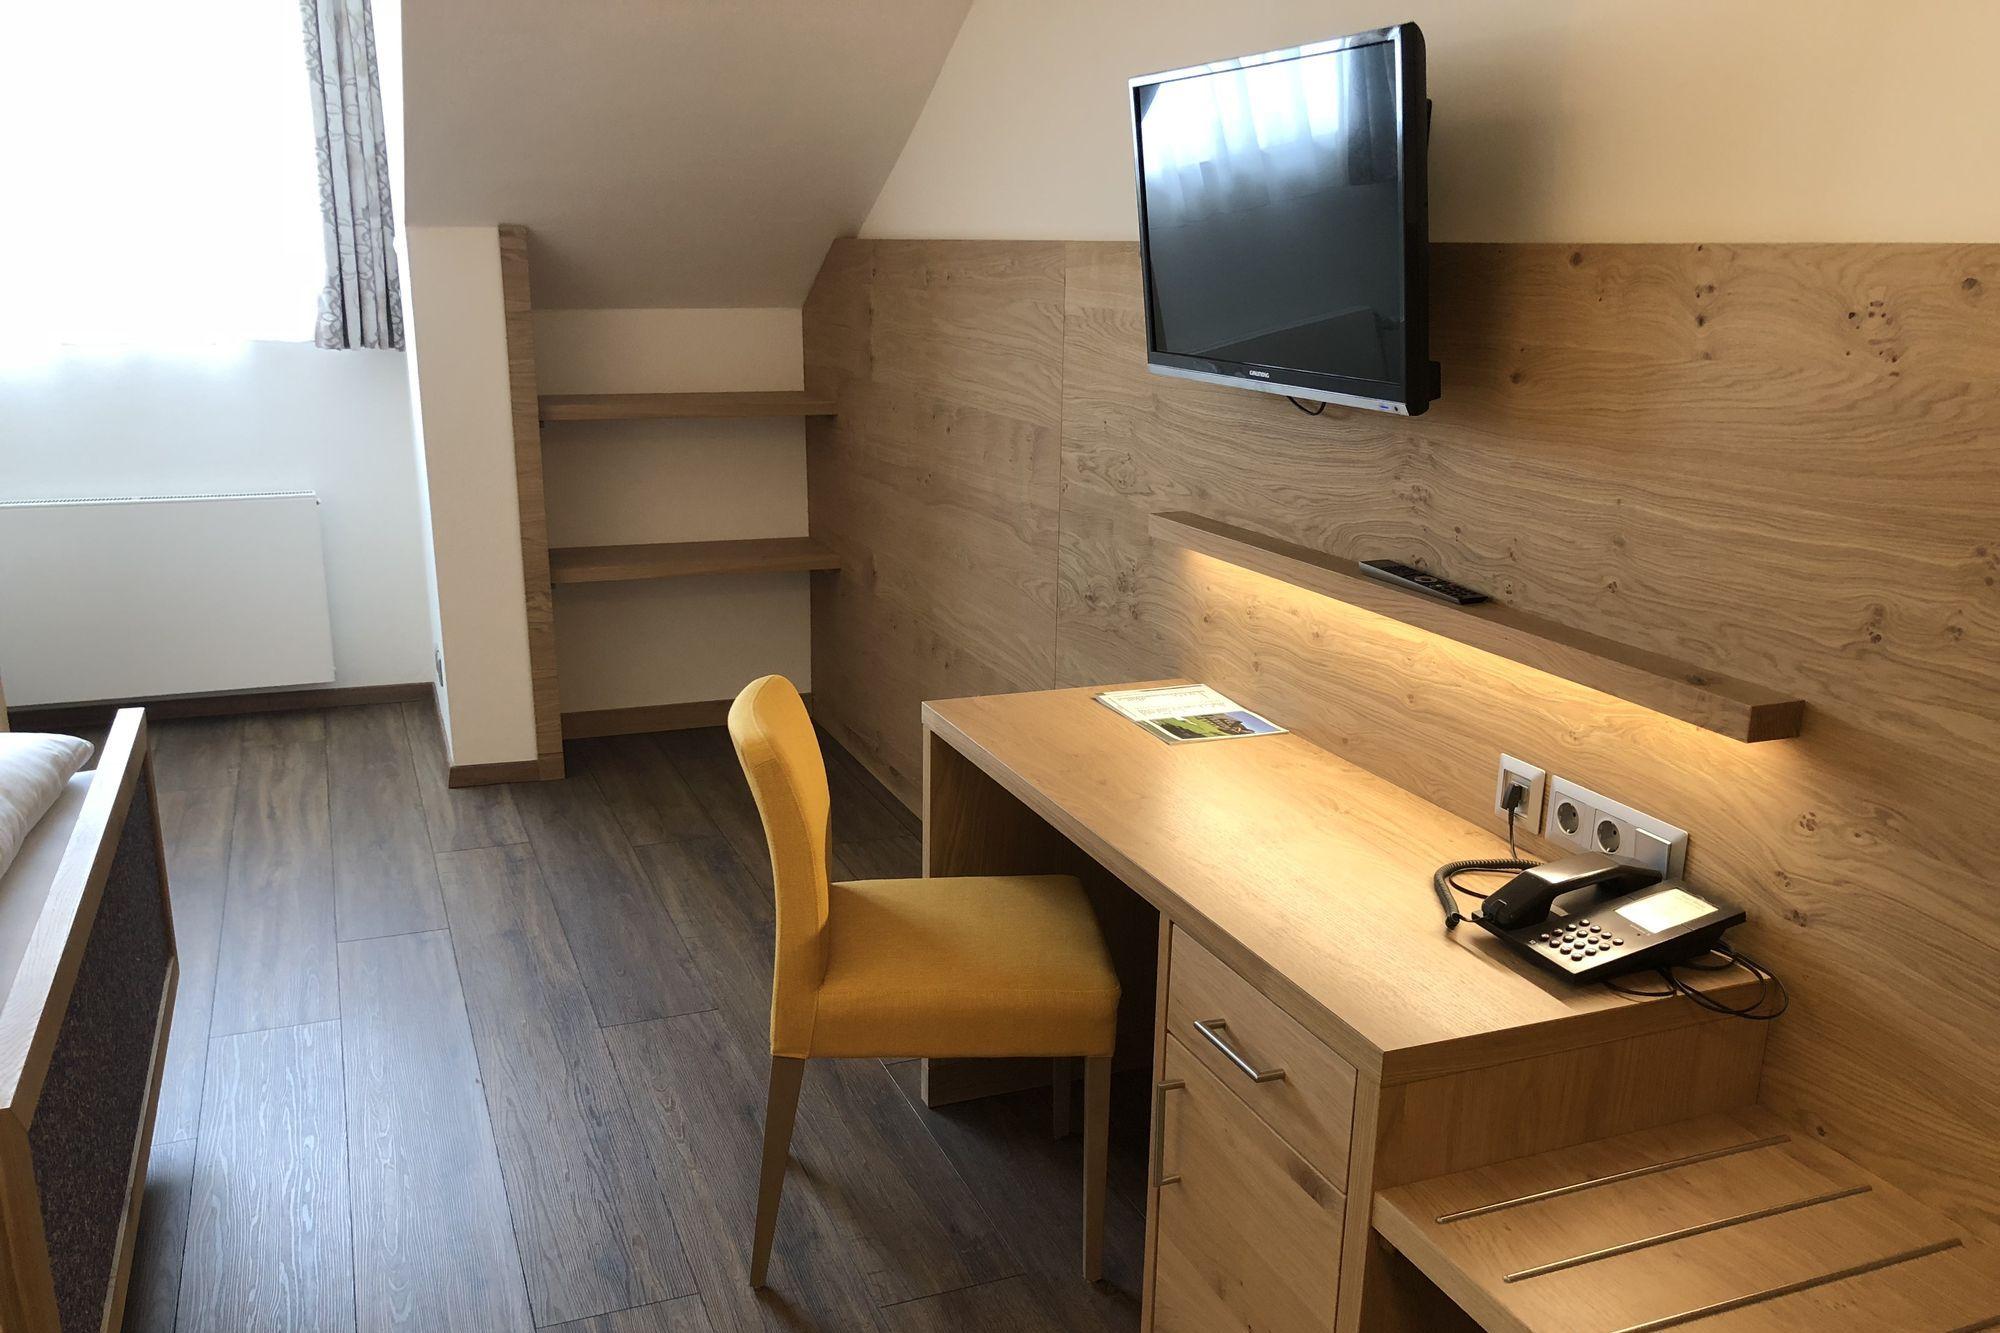 https://www.hotelbinder.de/wp-content/uploads/einzelzimmer1_6.jpg